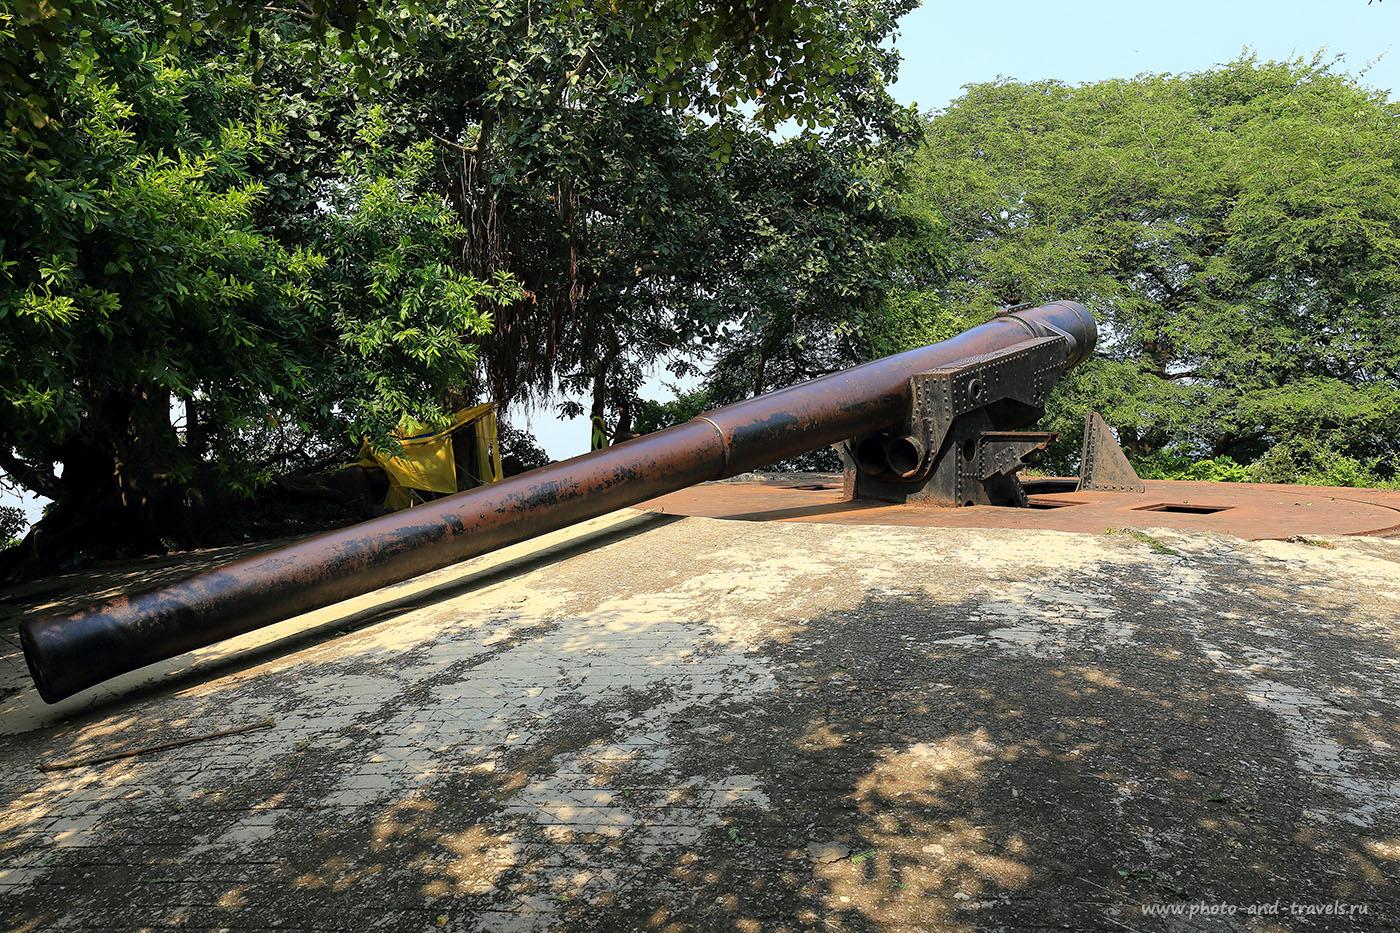 Фотография 22. Пушка на смотровой площадке острова Elephanta Island (Gharapuri Island) в Мубаи. (24-70, 1/125, 0eV, f9, 24 mm, ISO 100)